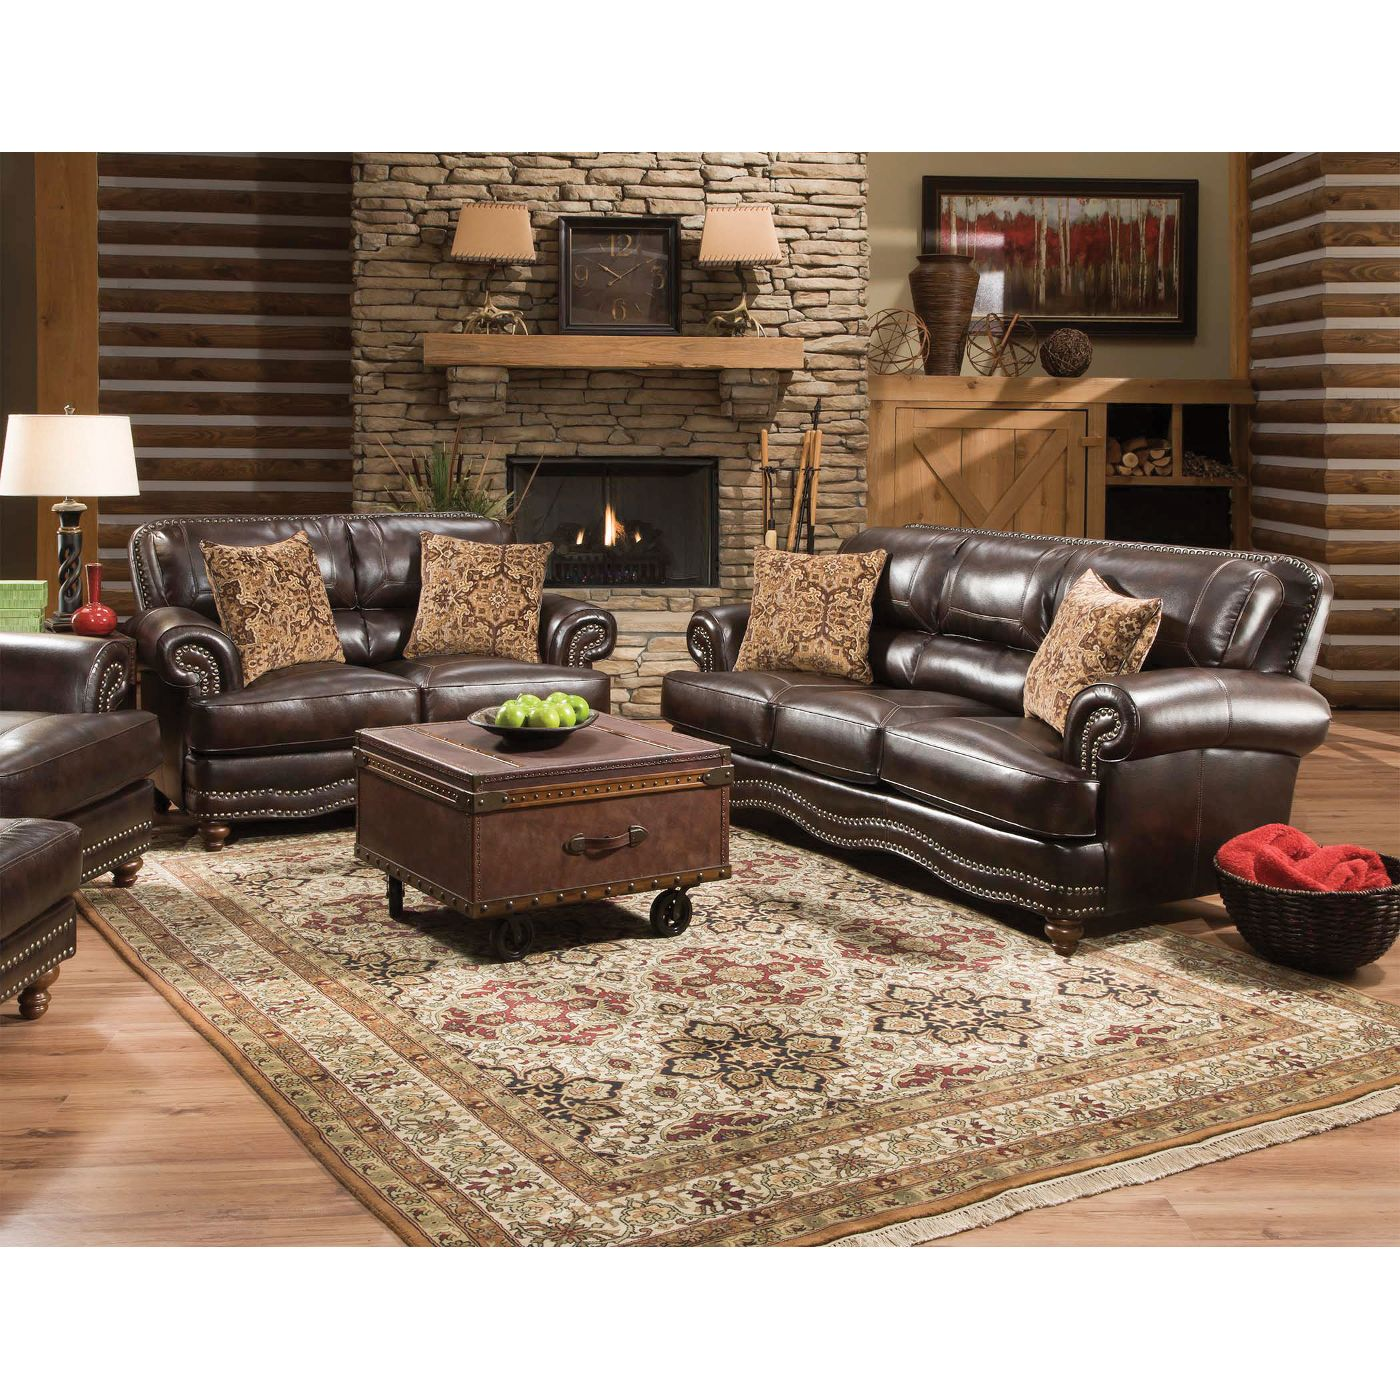 Bentley Living Room Sofa Loveseat Chair Ottoman 71a Conn S Love Seat Loveseat Sofa Luxury Sofa